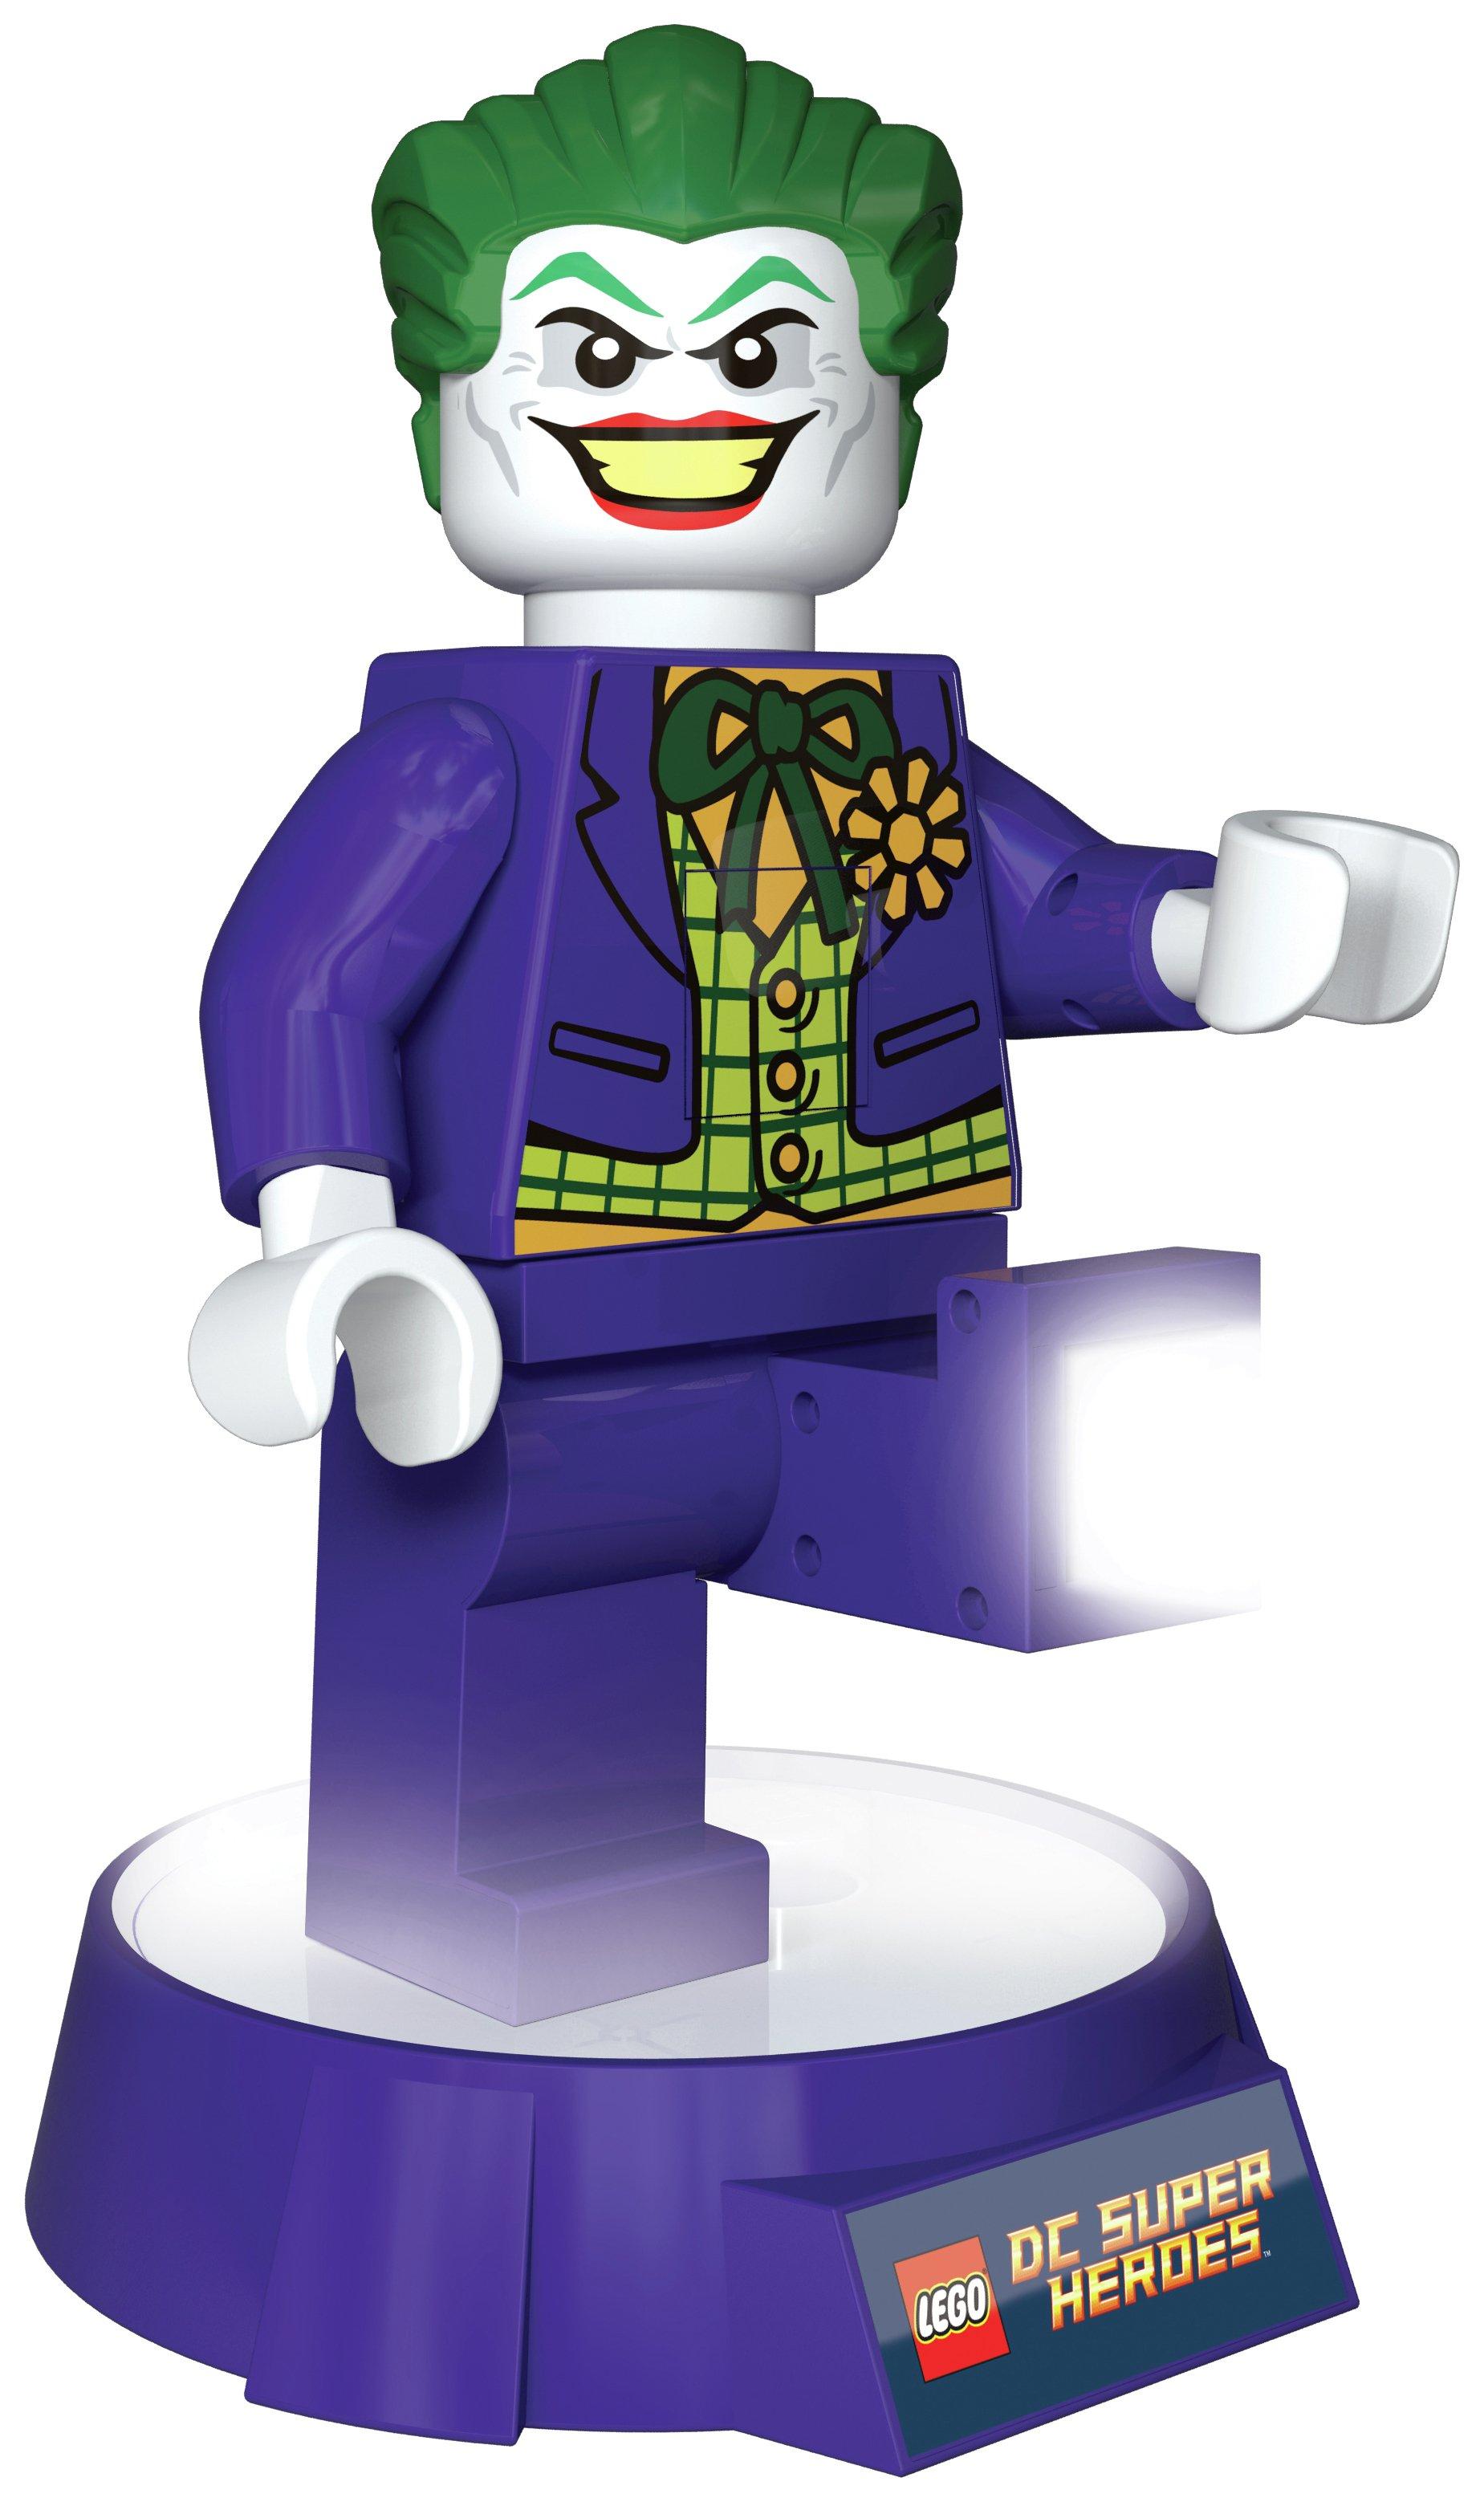 LEGO DC Super Heroes The Joker Torch